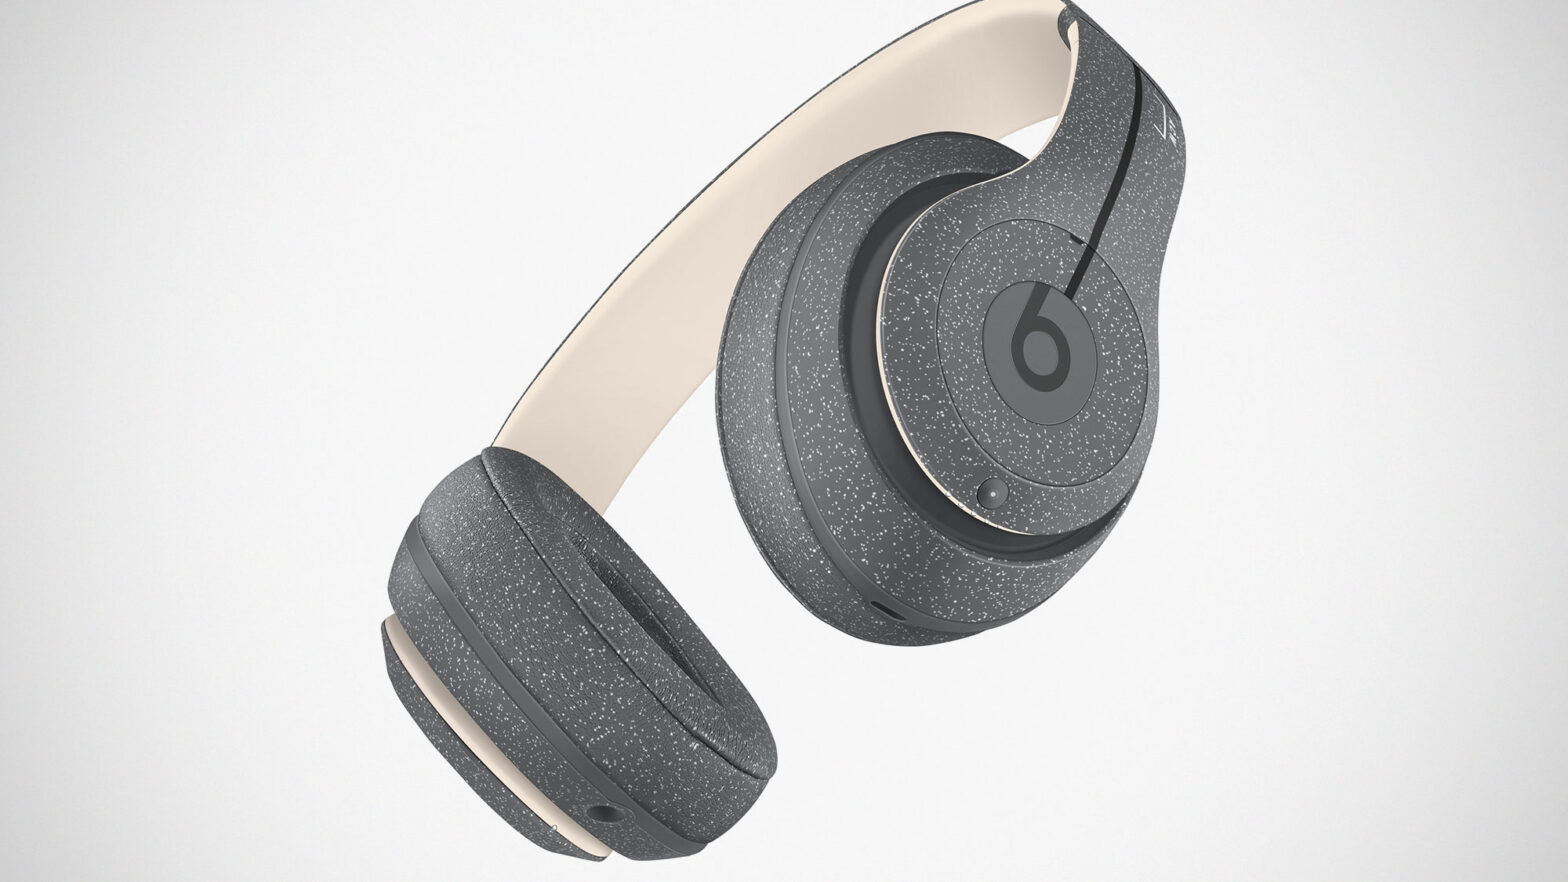 Beats Studio3 Wireless A-COLD-WALL Cement Headphone